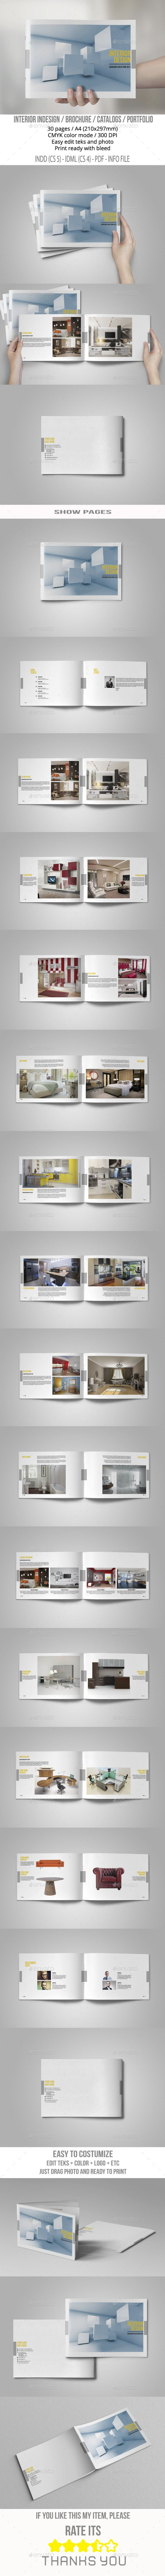 Catalogs Interior Brochure